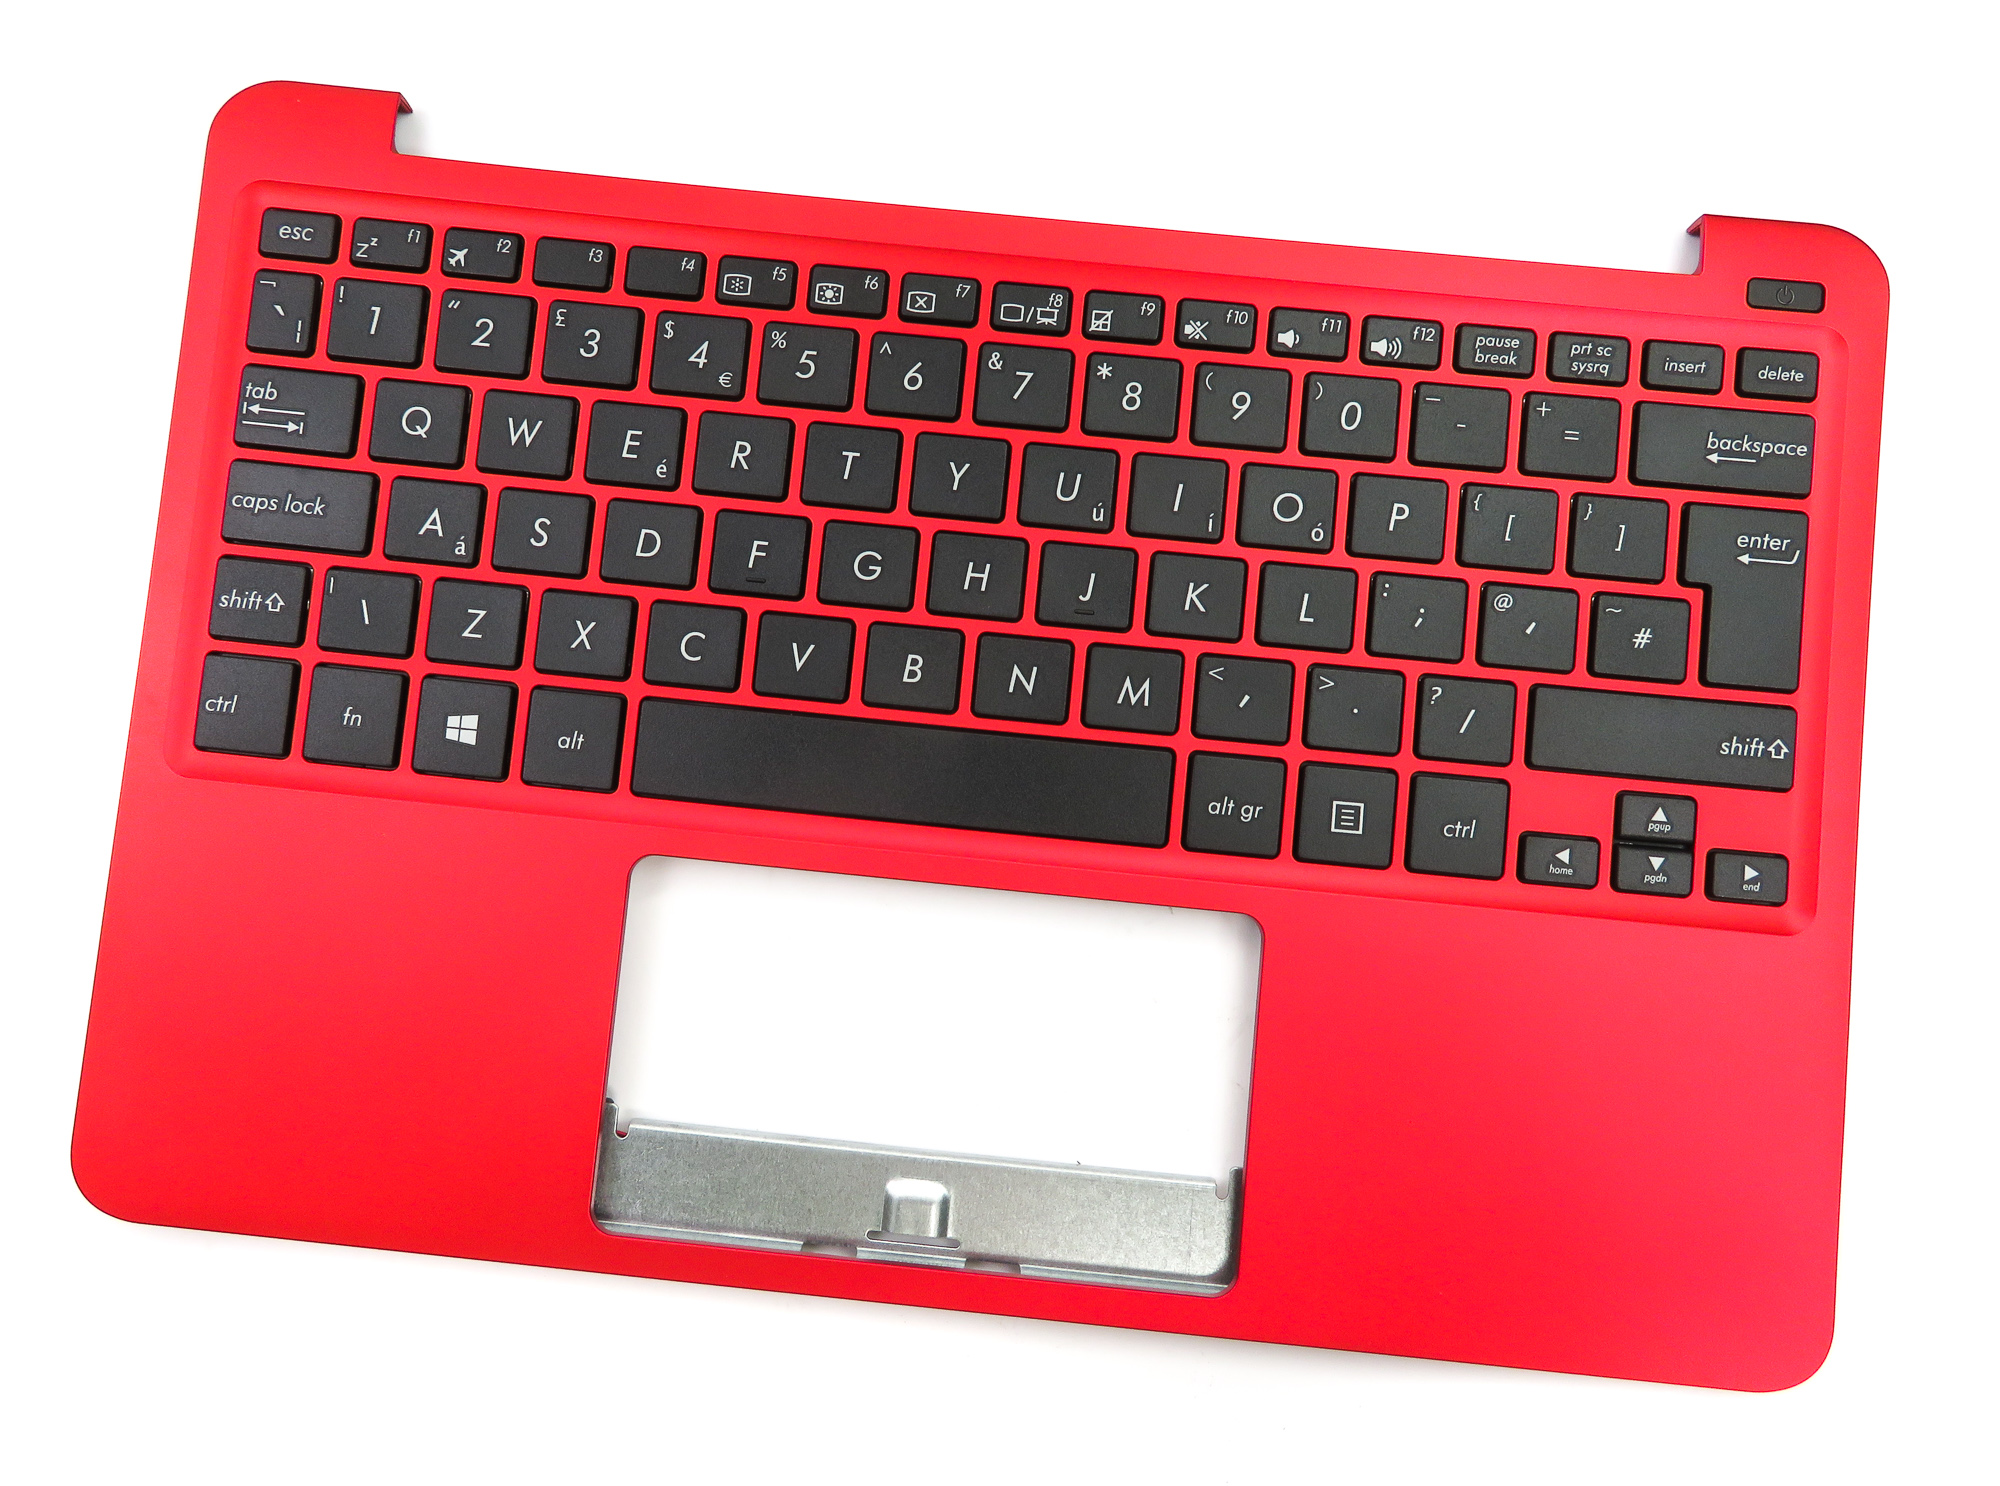 Asus 90NL0734-R31UK0 UK Keyboard Palmrest /f Notebook X Series X205TA Red